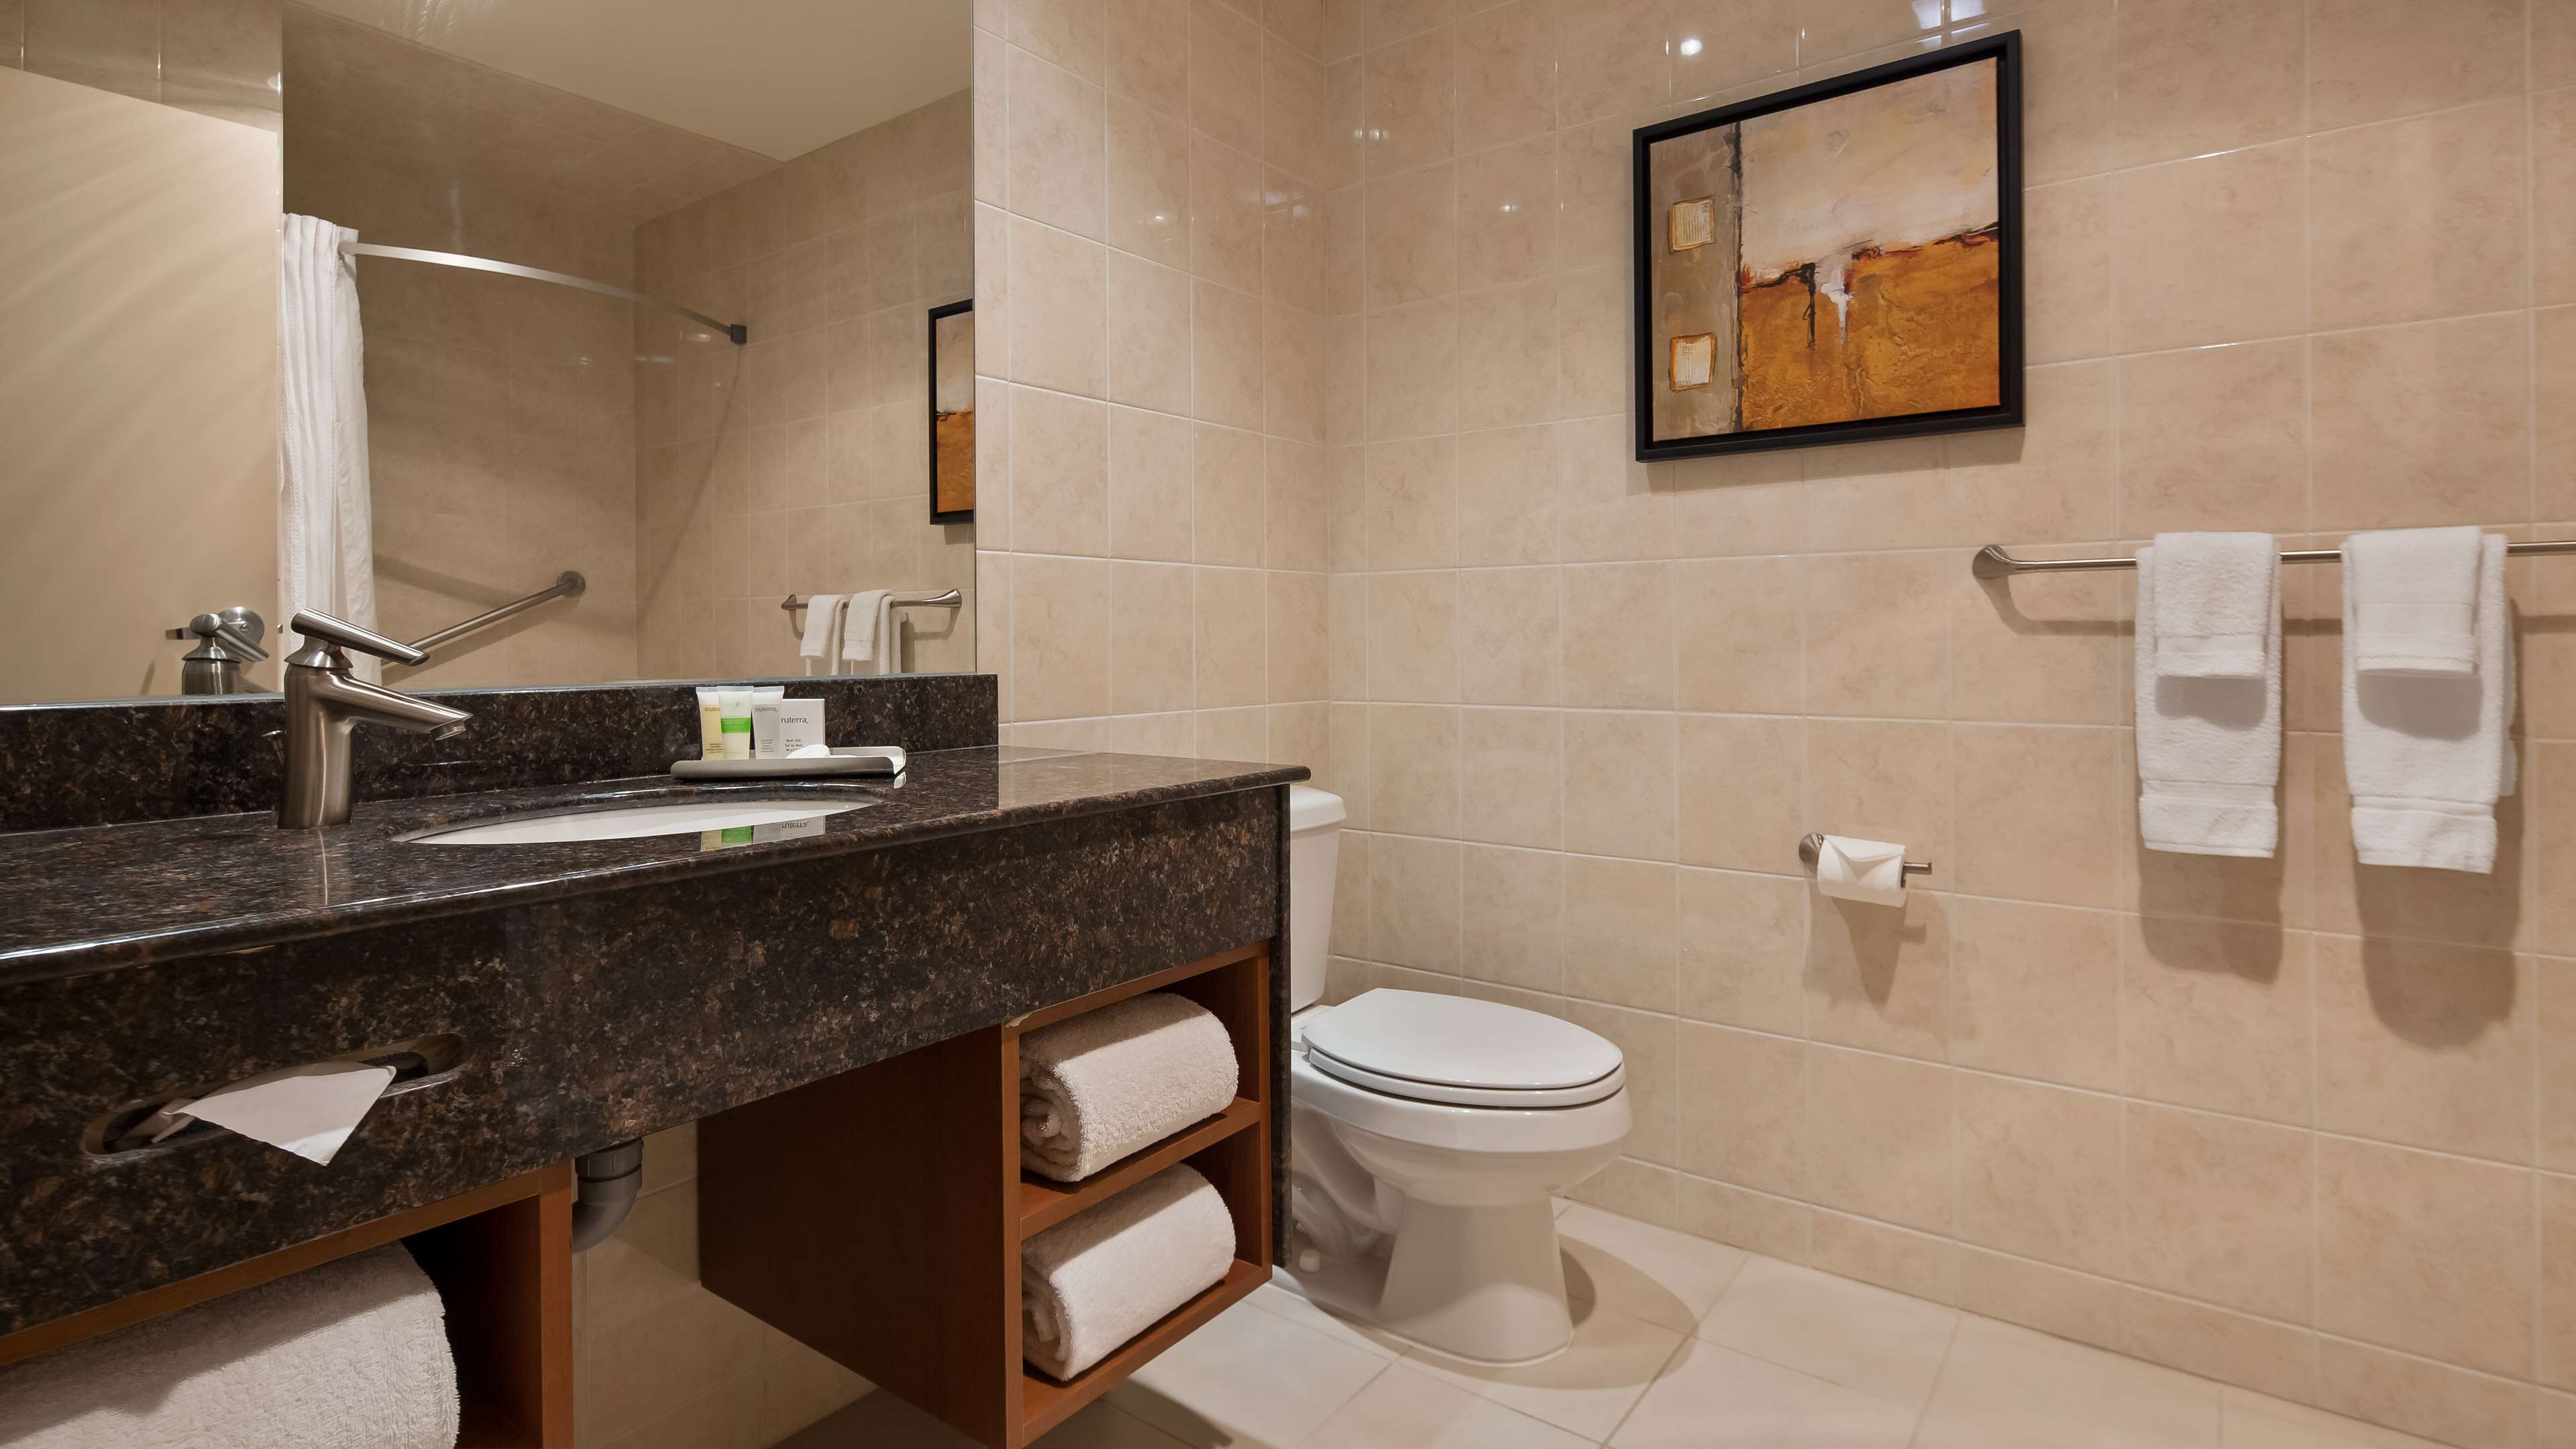 Guest Bathroom Best Western Plus Orangeville Inn & Suites Orangeville (519)941-3311